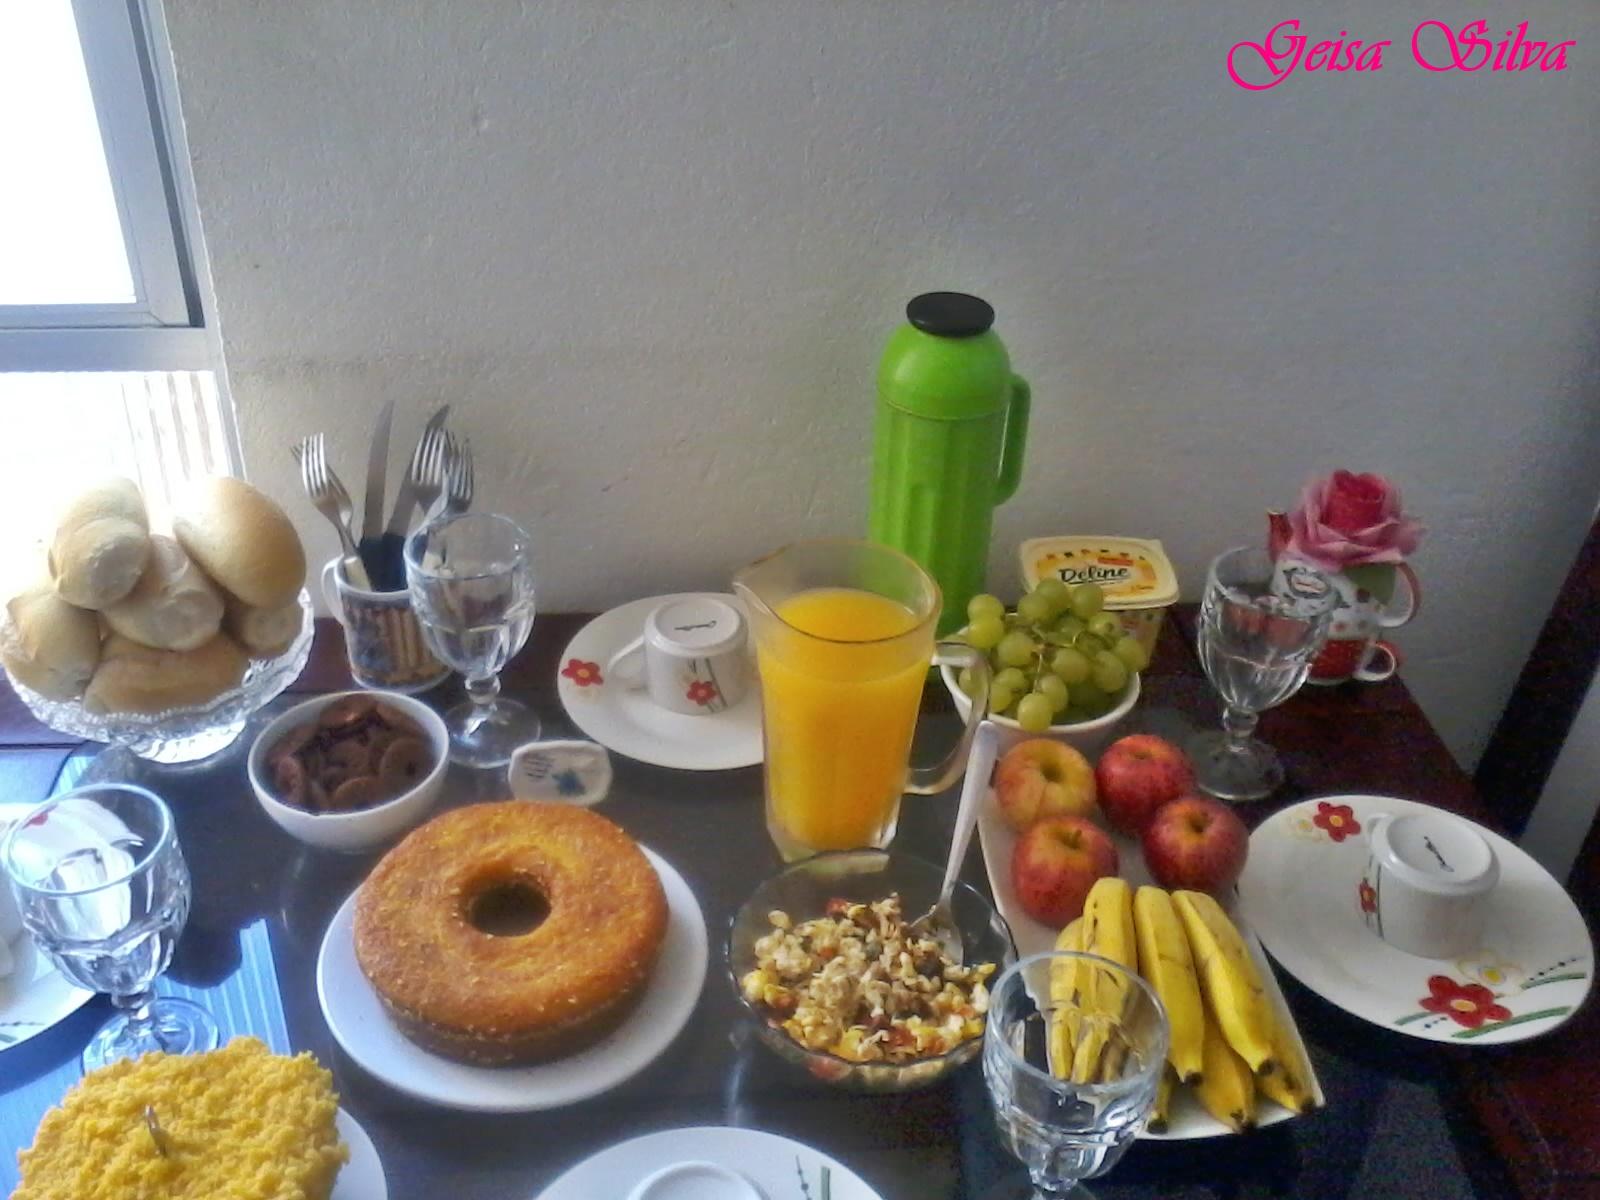 Mesa posta Caf da manh  Acheguese